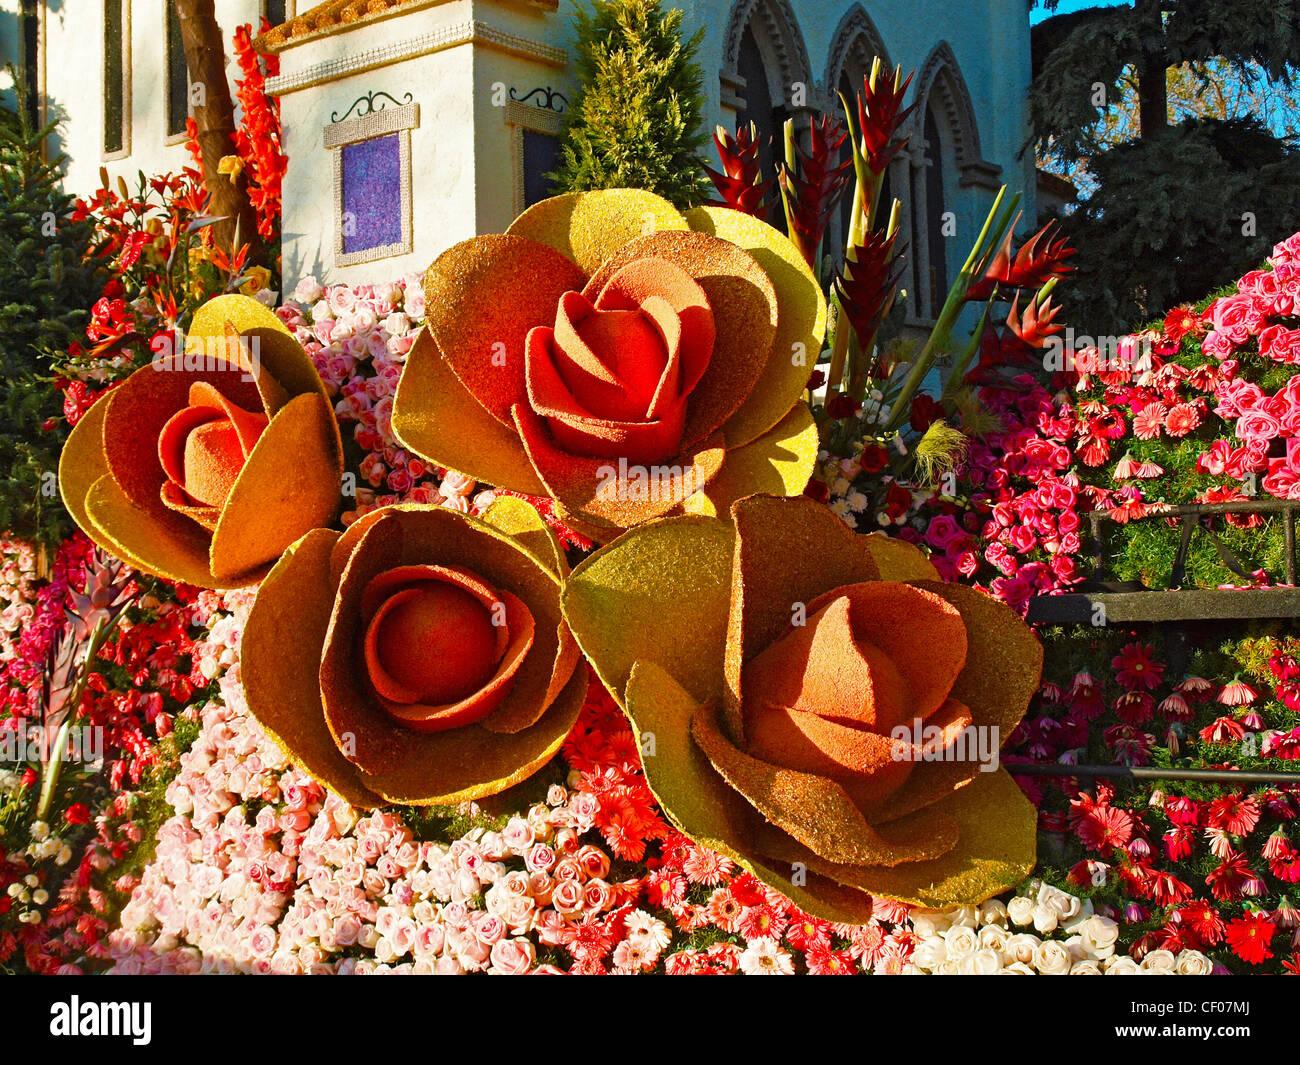 Design Detail On The 2012 Rose Parade Float From Loyola Marymount University